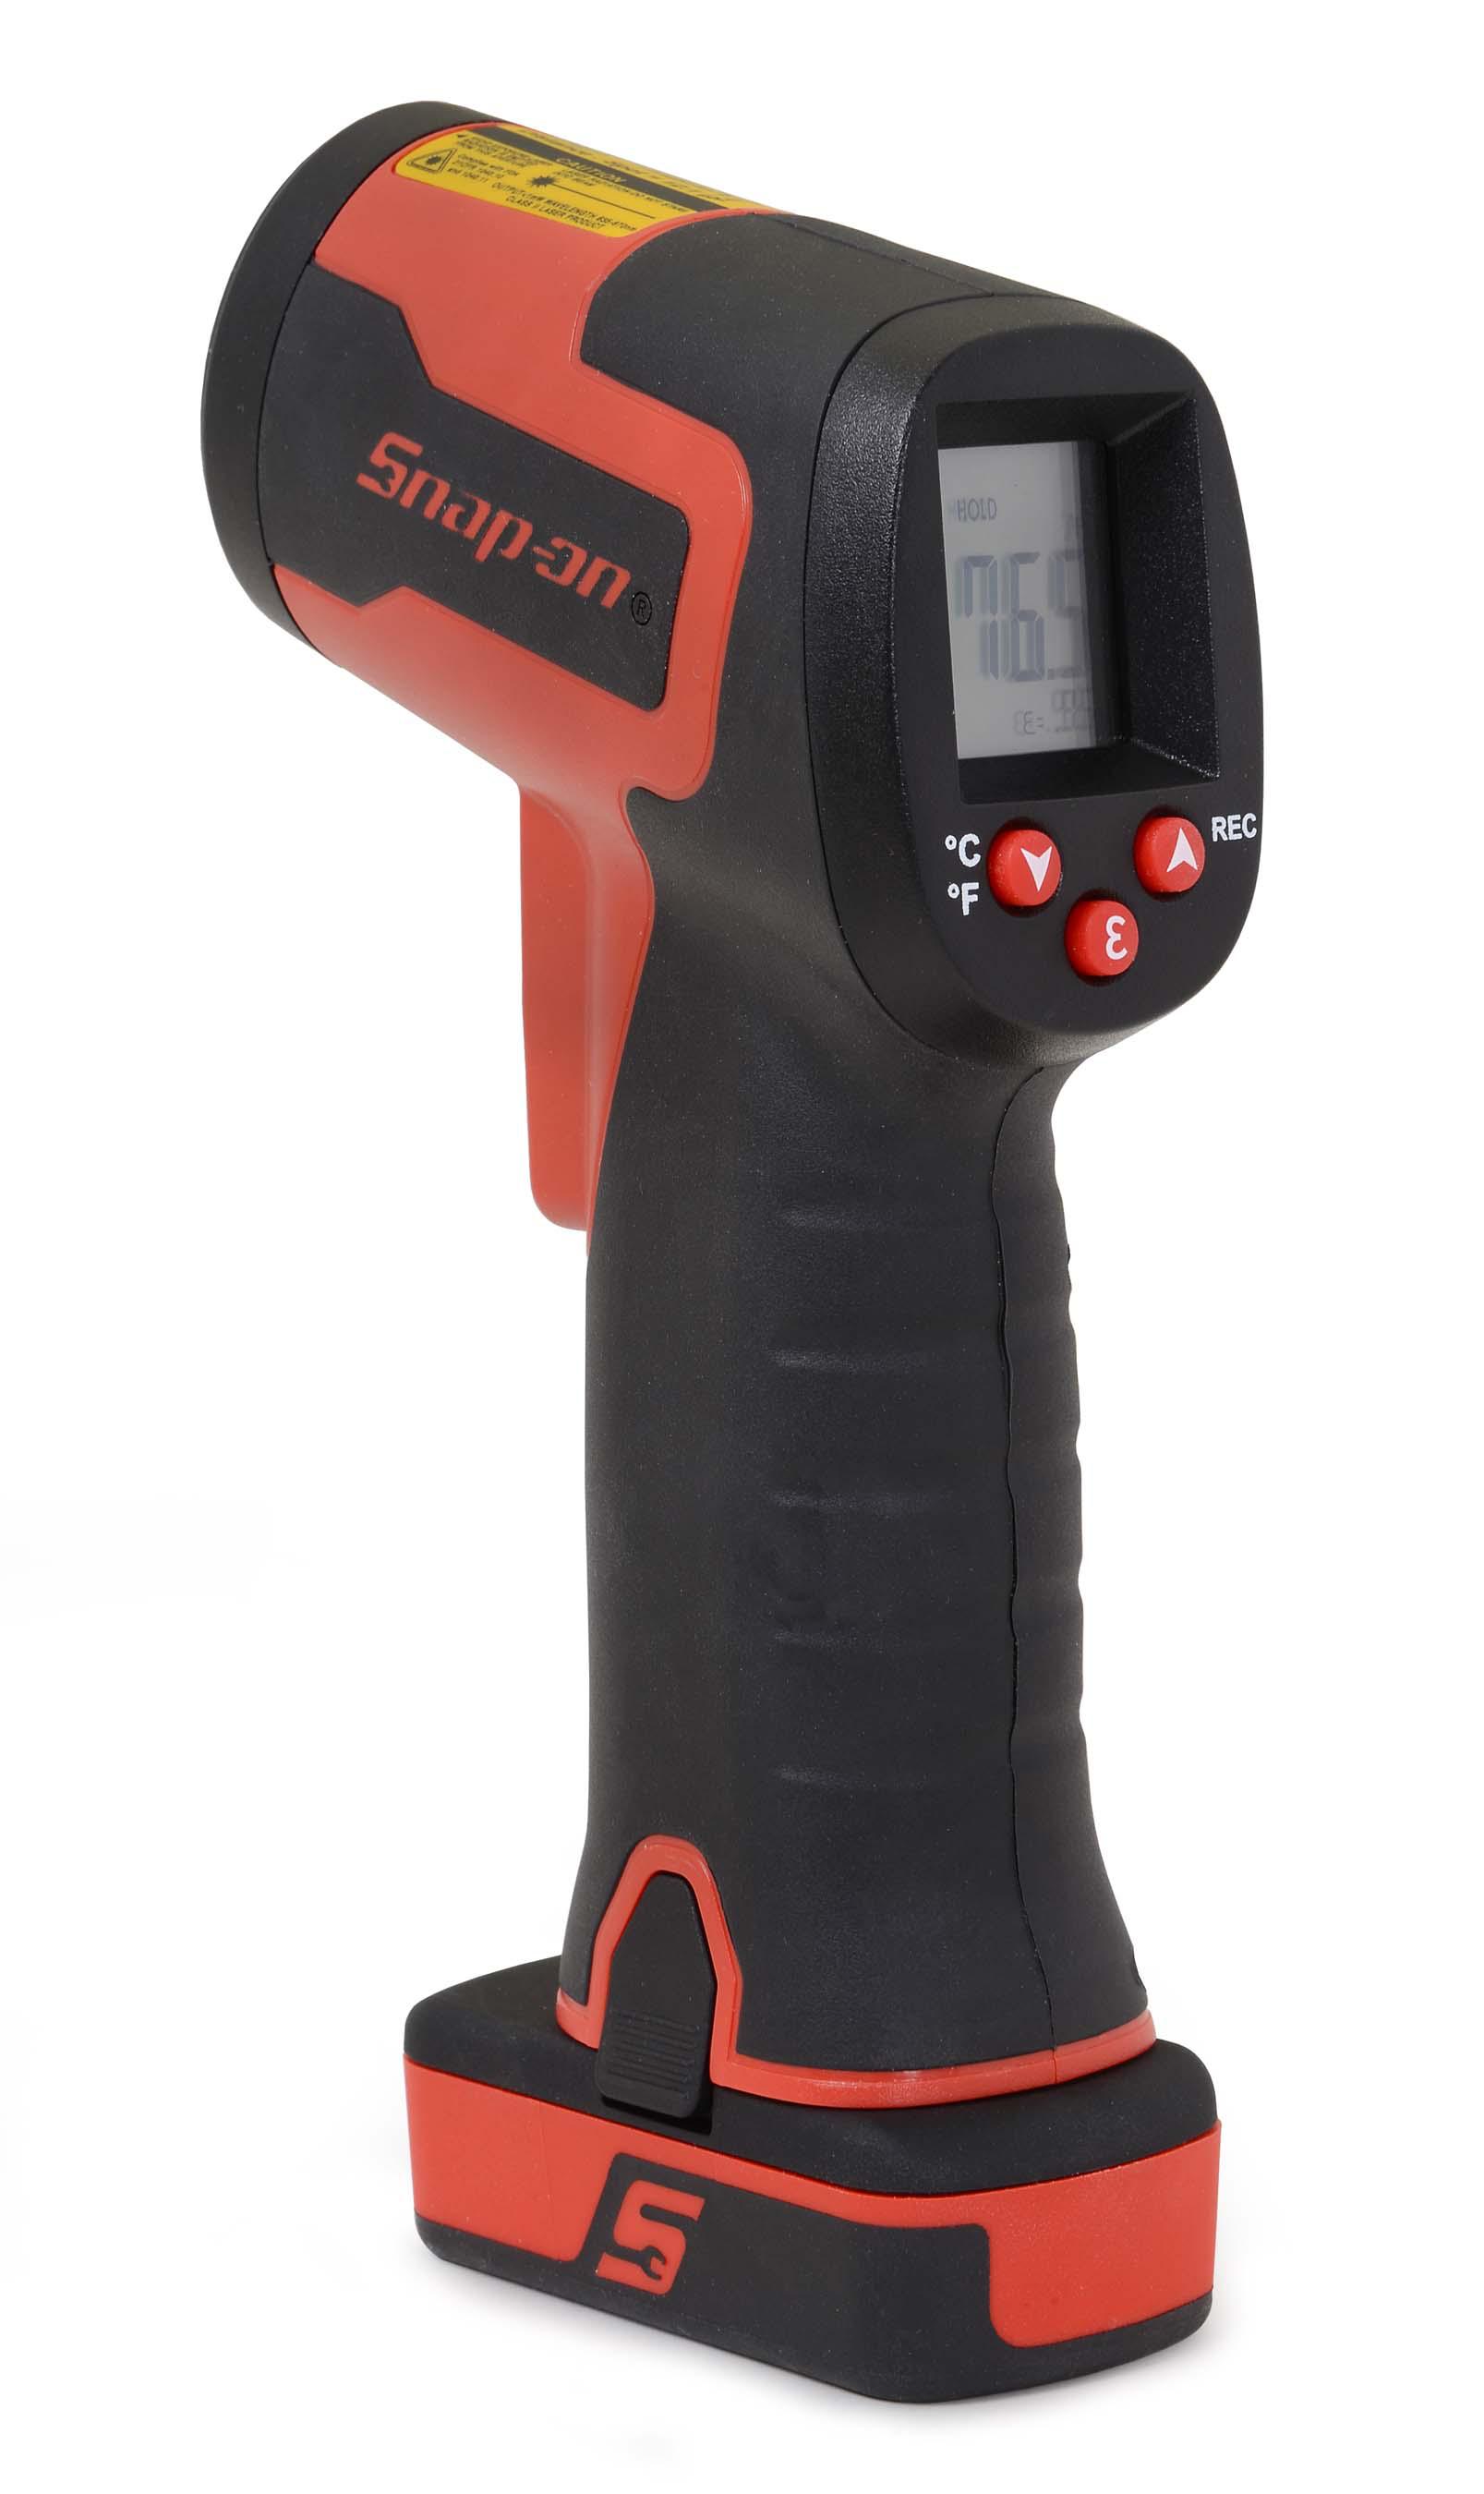 Snap-on-Cordless-Infrared-Temperature-Gun.jpg